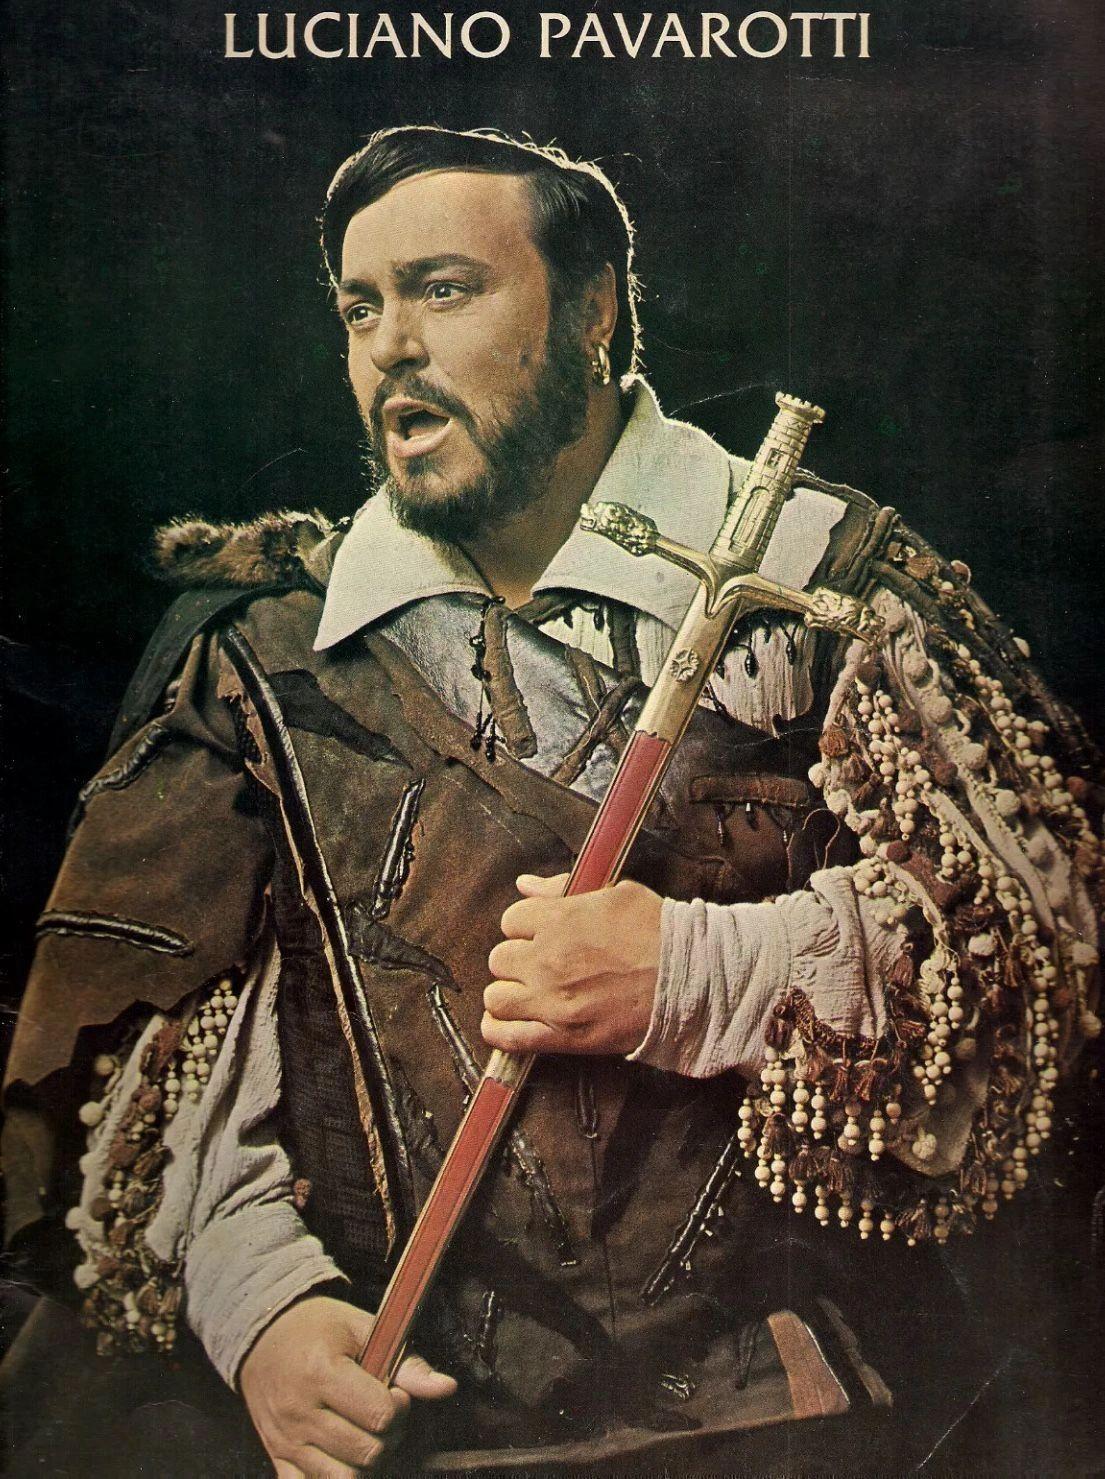 Luciano Pavaroti interpretando el duro papel de  Manrico en Il Trovatore